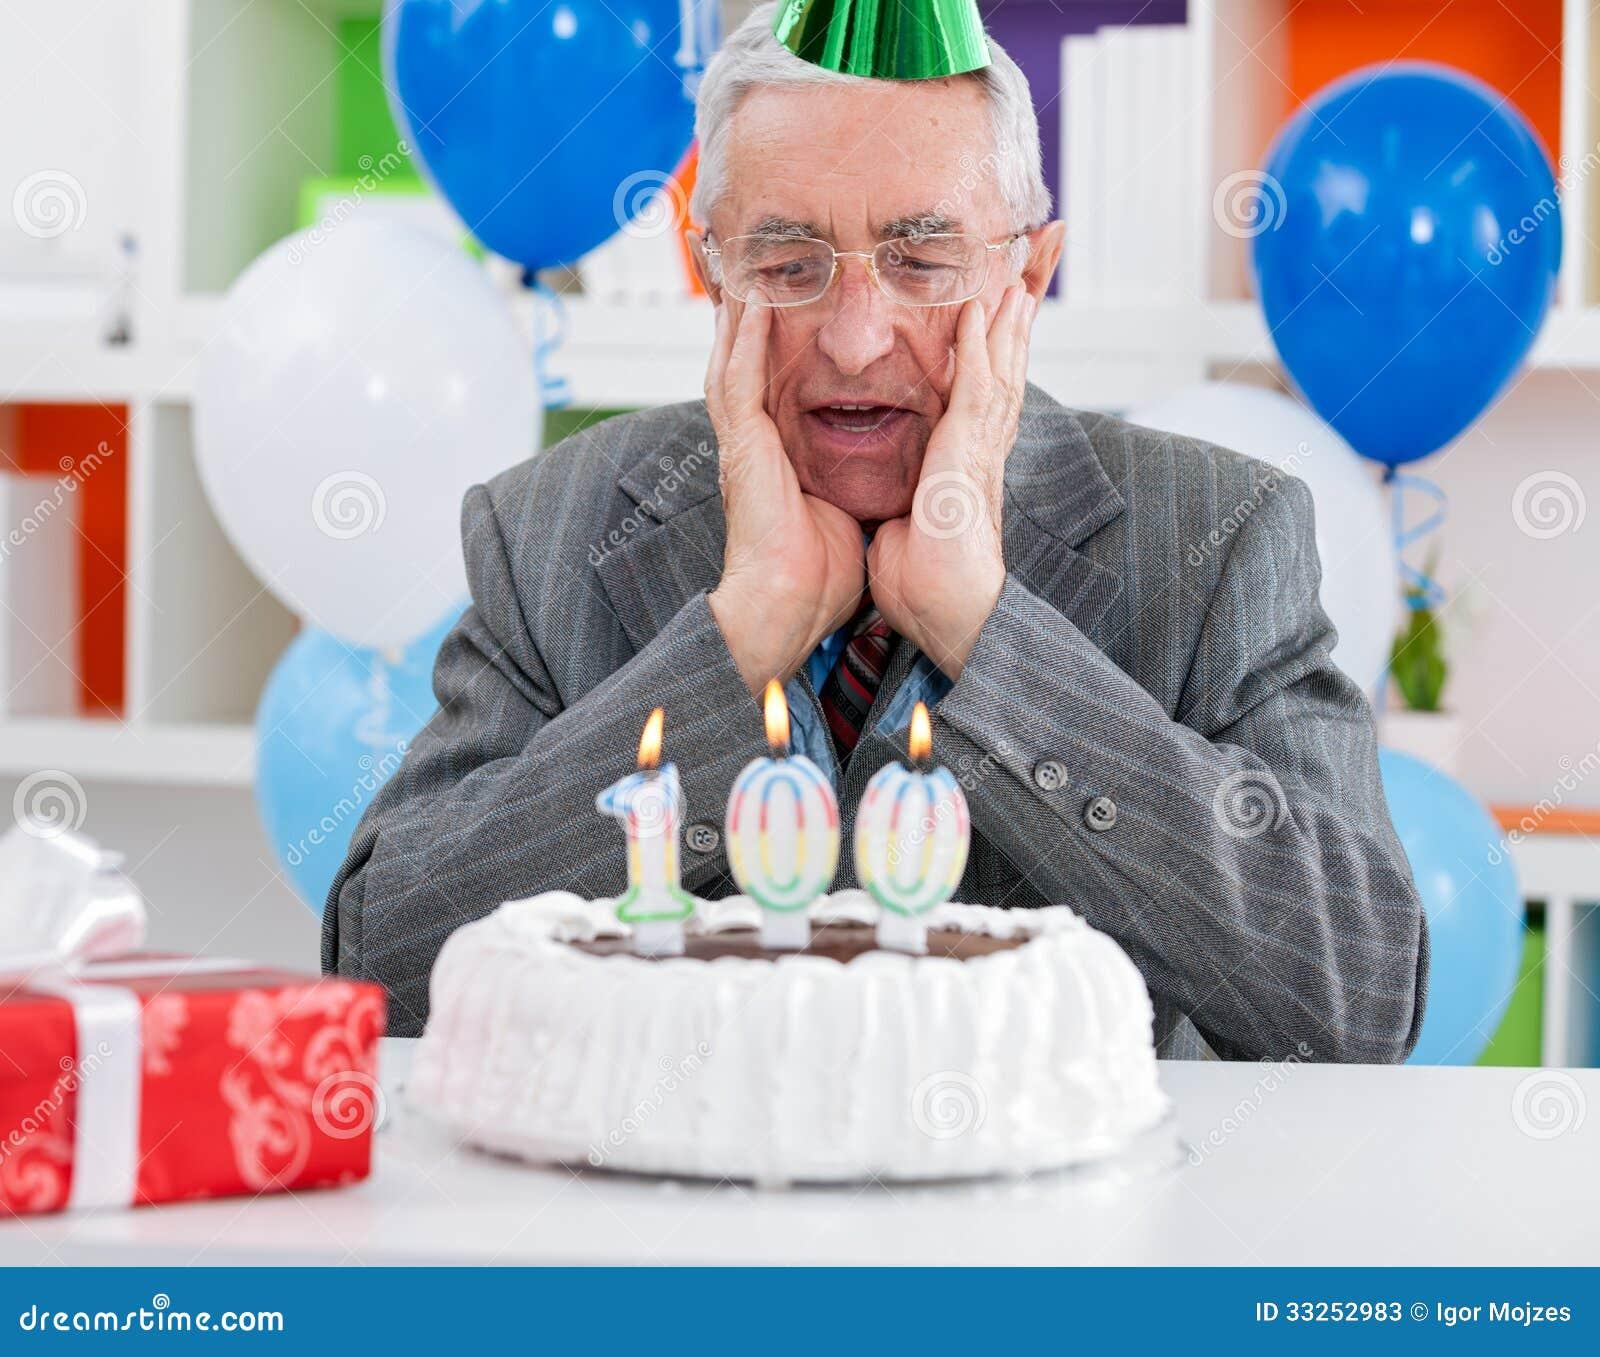 Surprised Senior Man Looking At Birthday Cake Stock Image Image Of